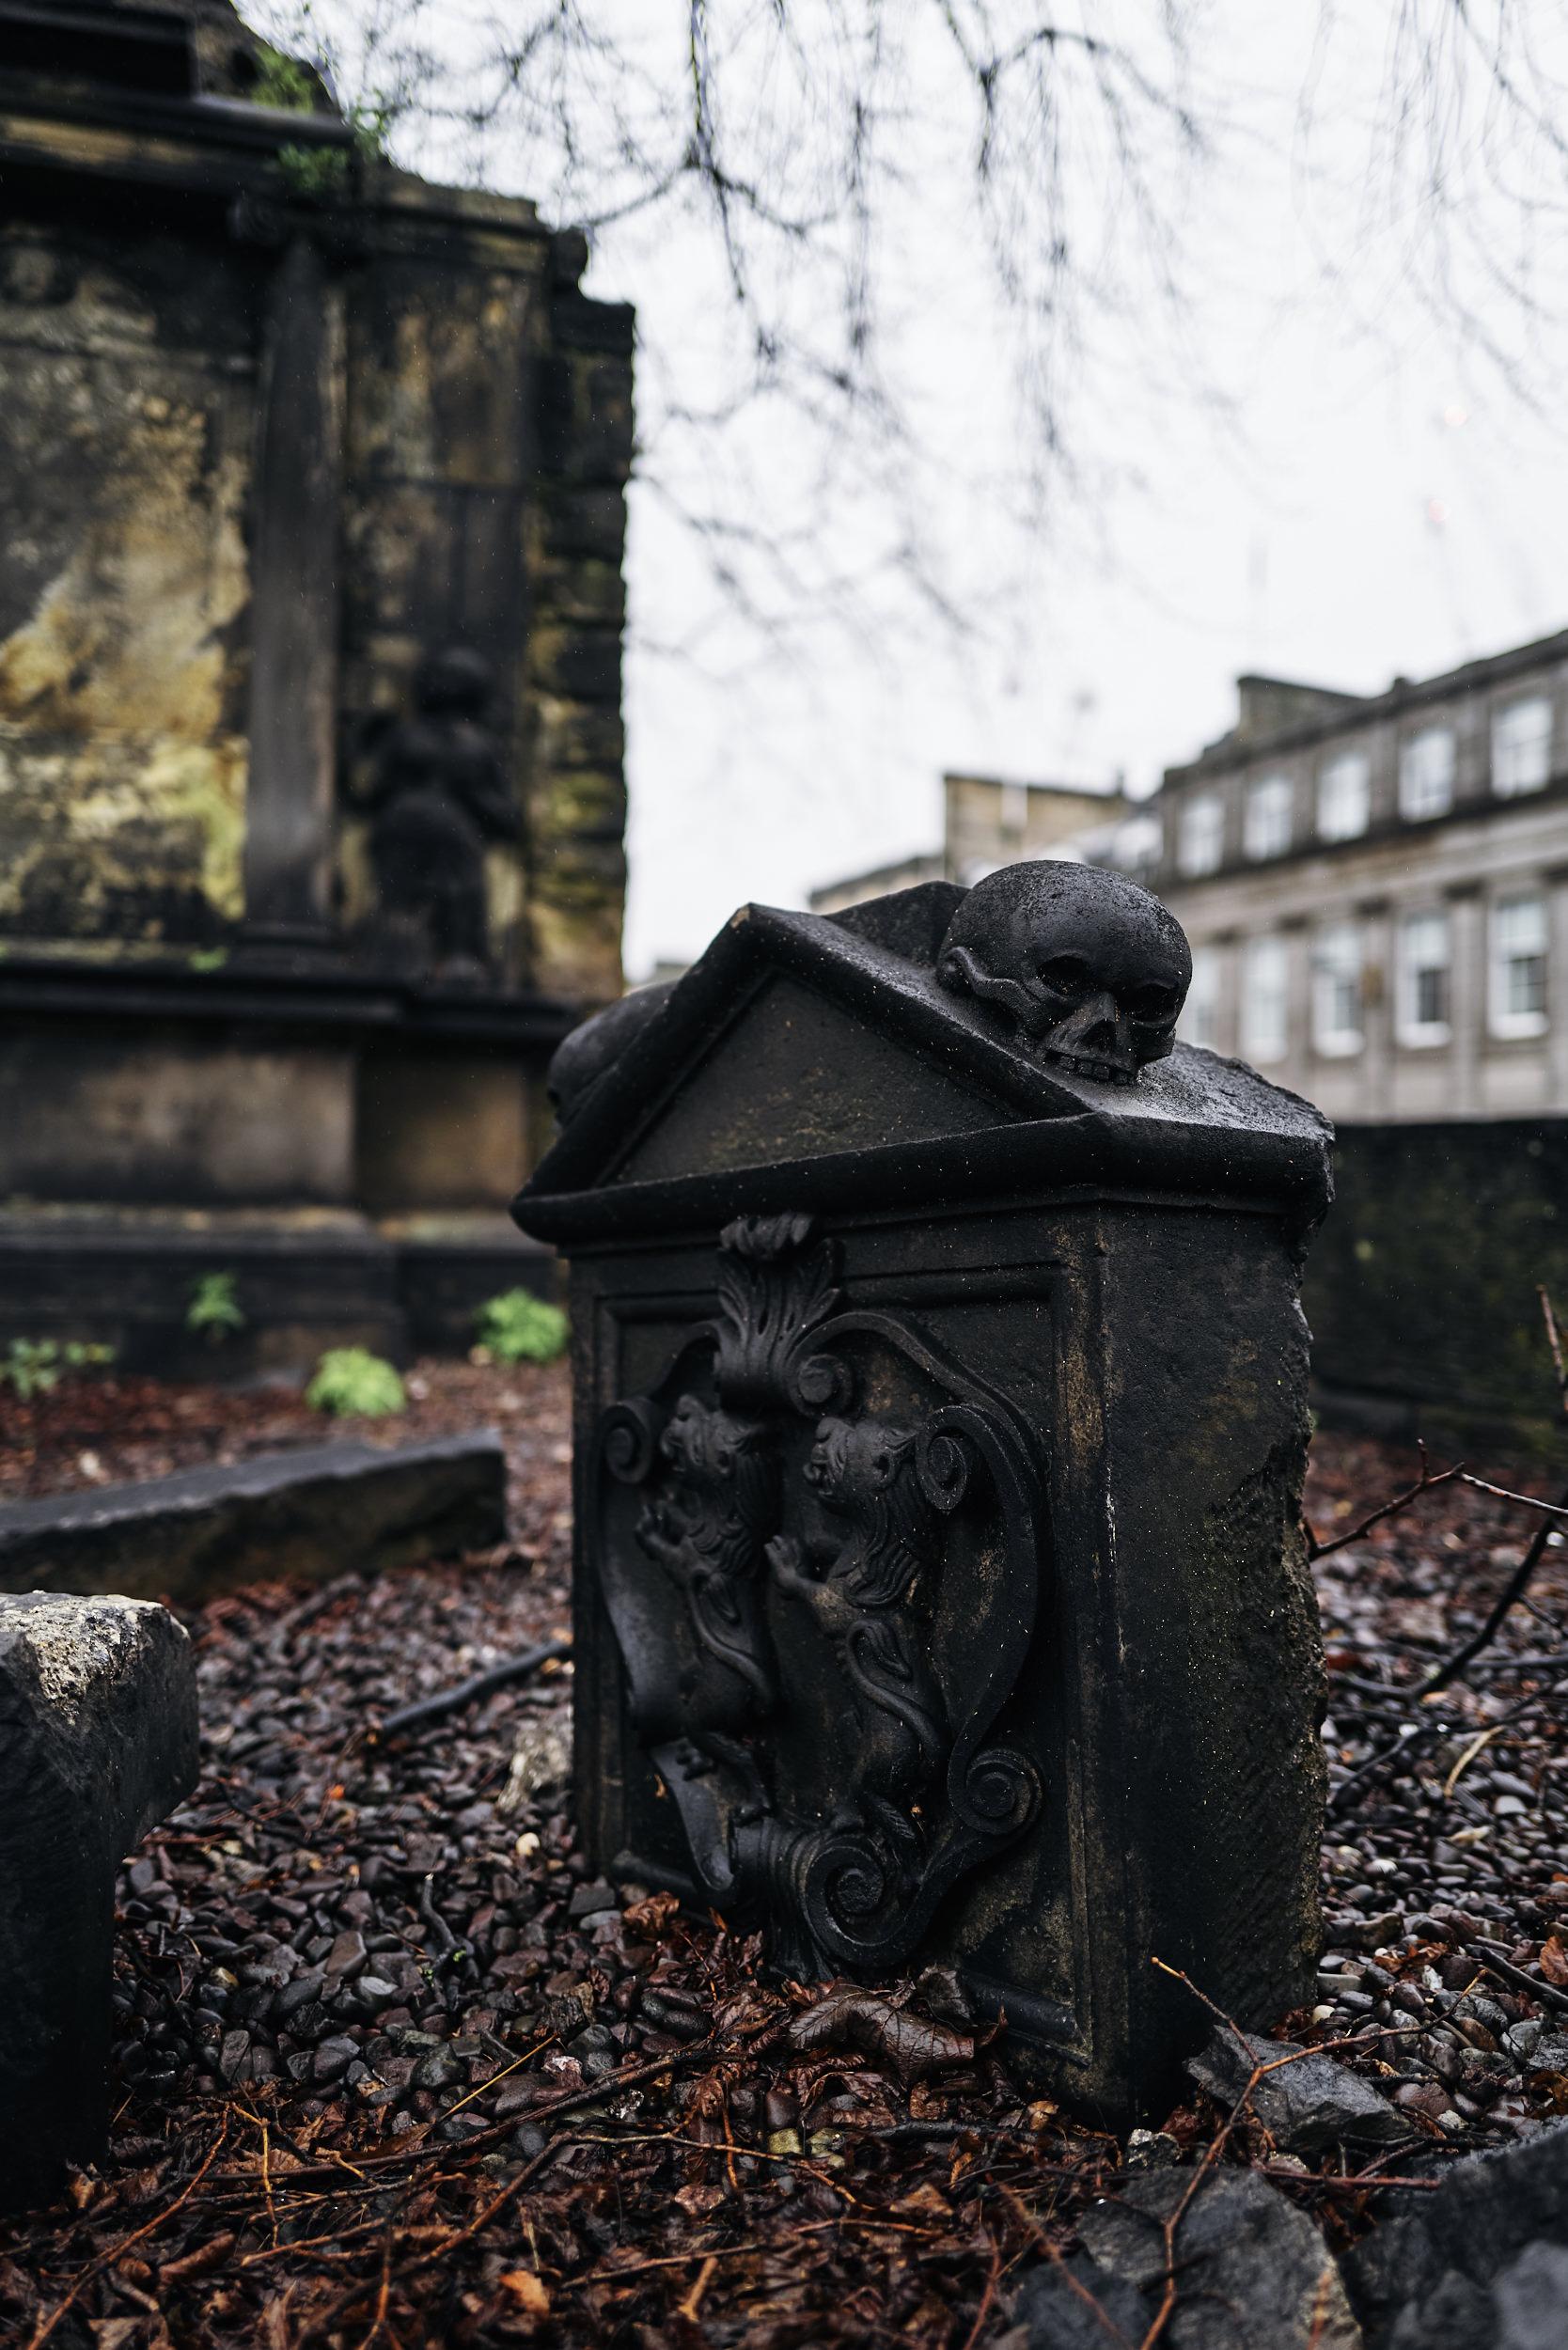 2019 04 14 - Scotland 2019 Q2 26.jpg